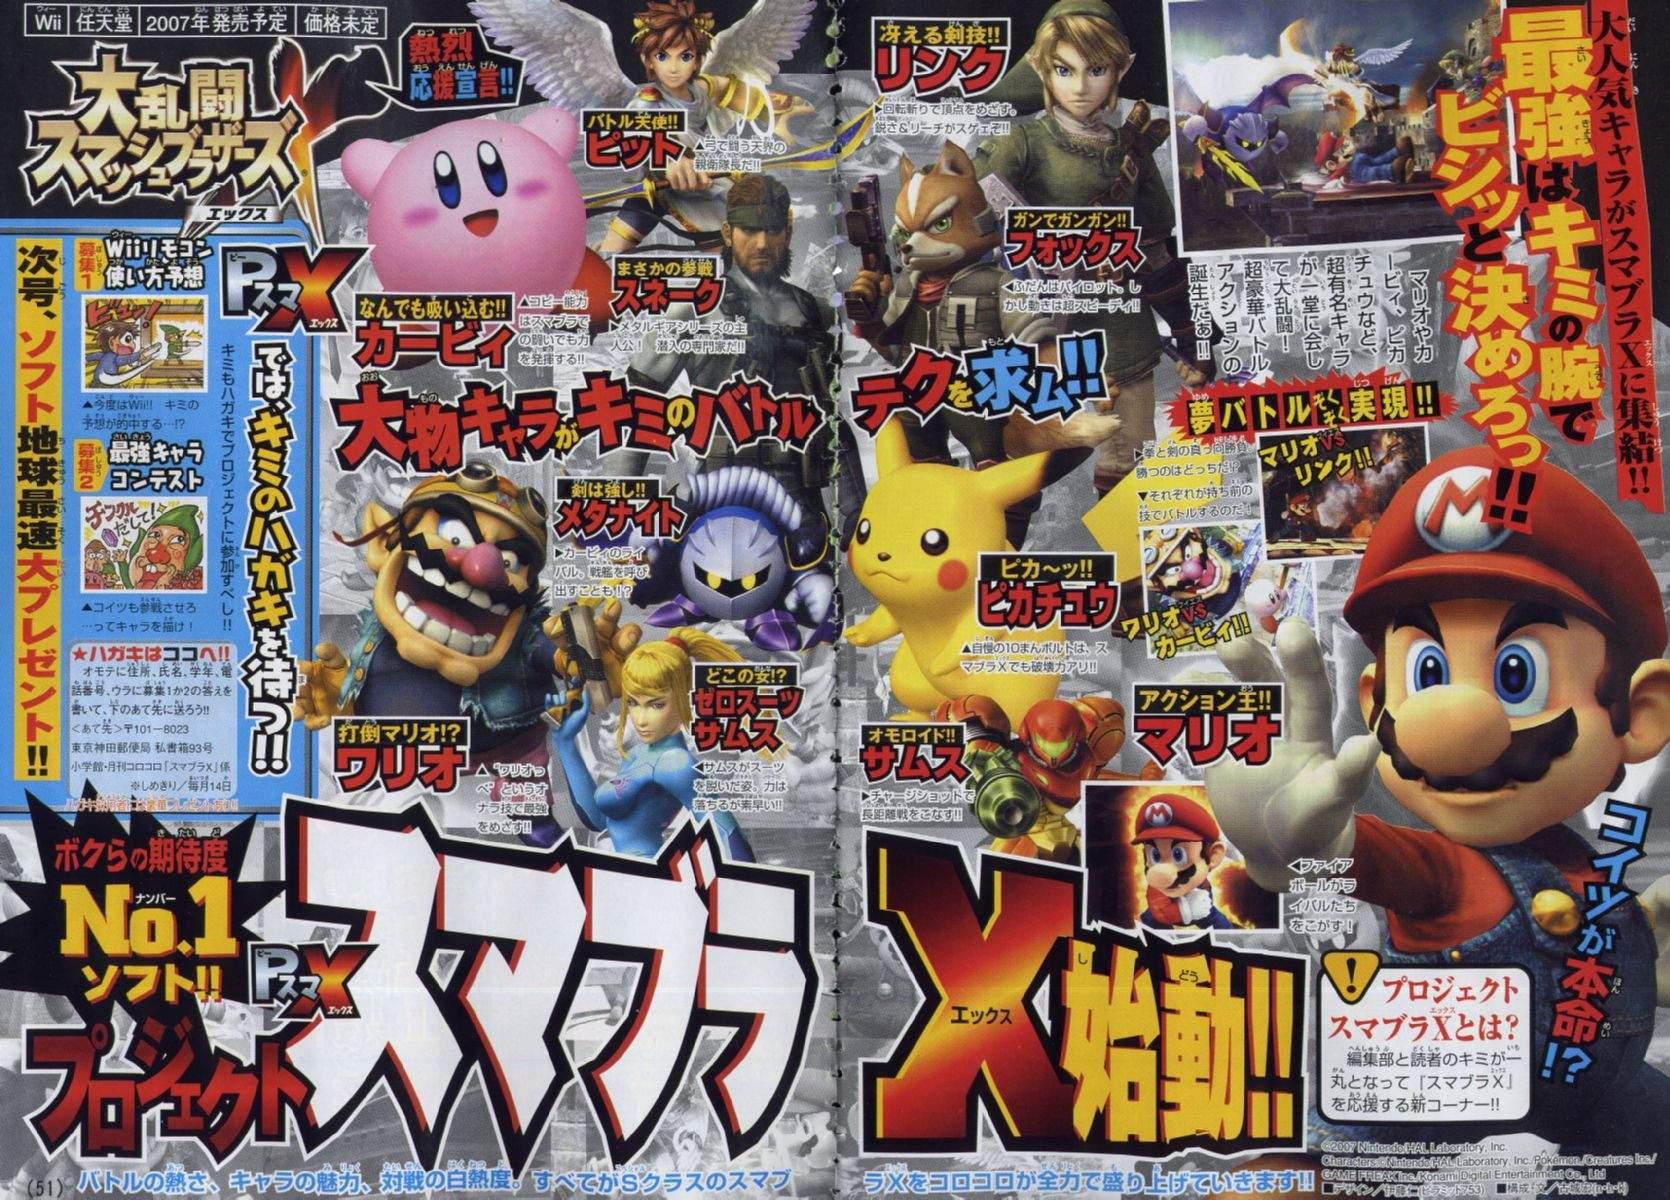 Super Smash Bros. Brawl Scan